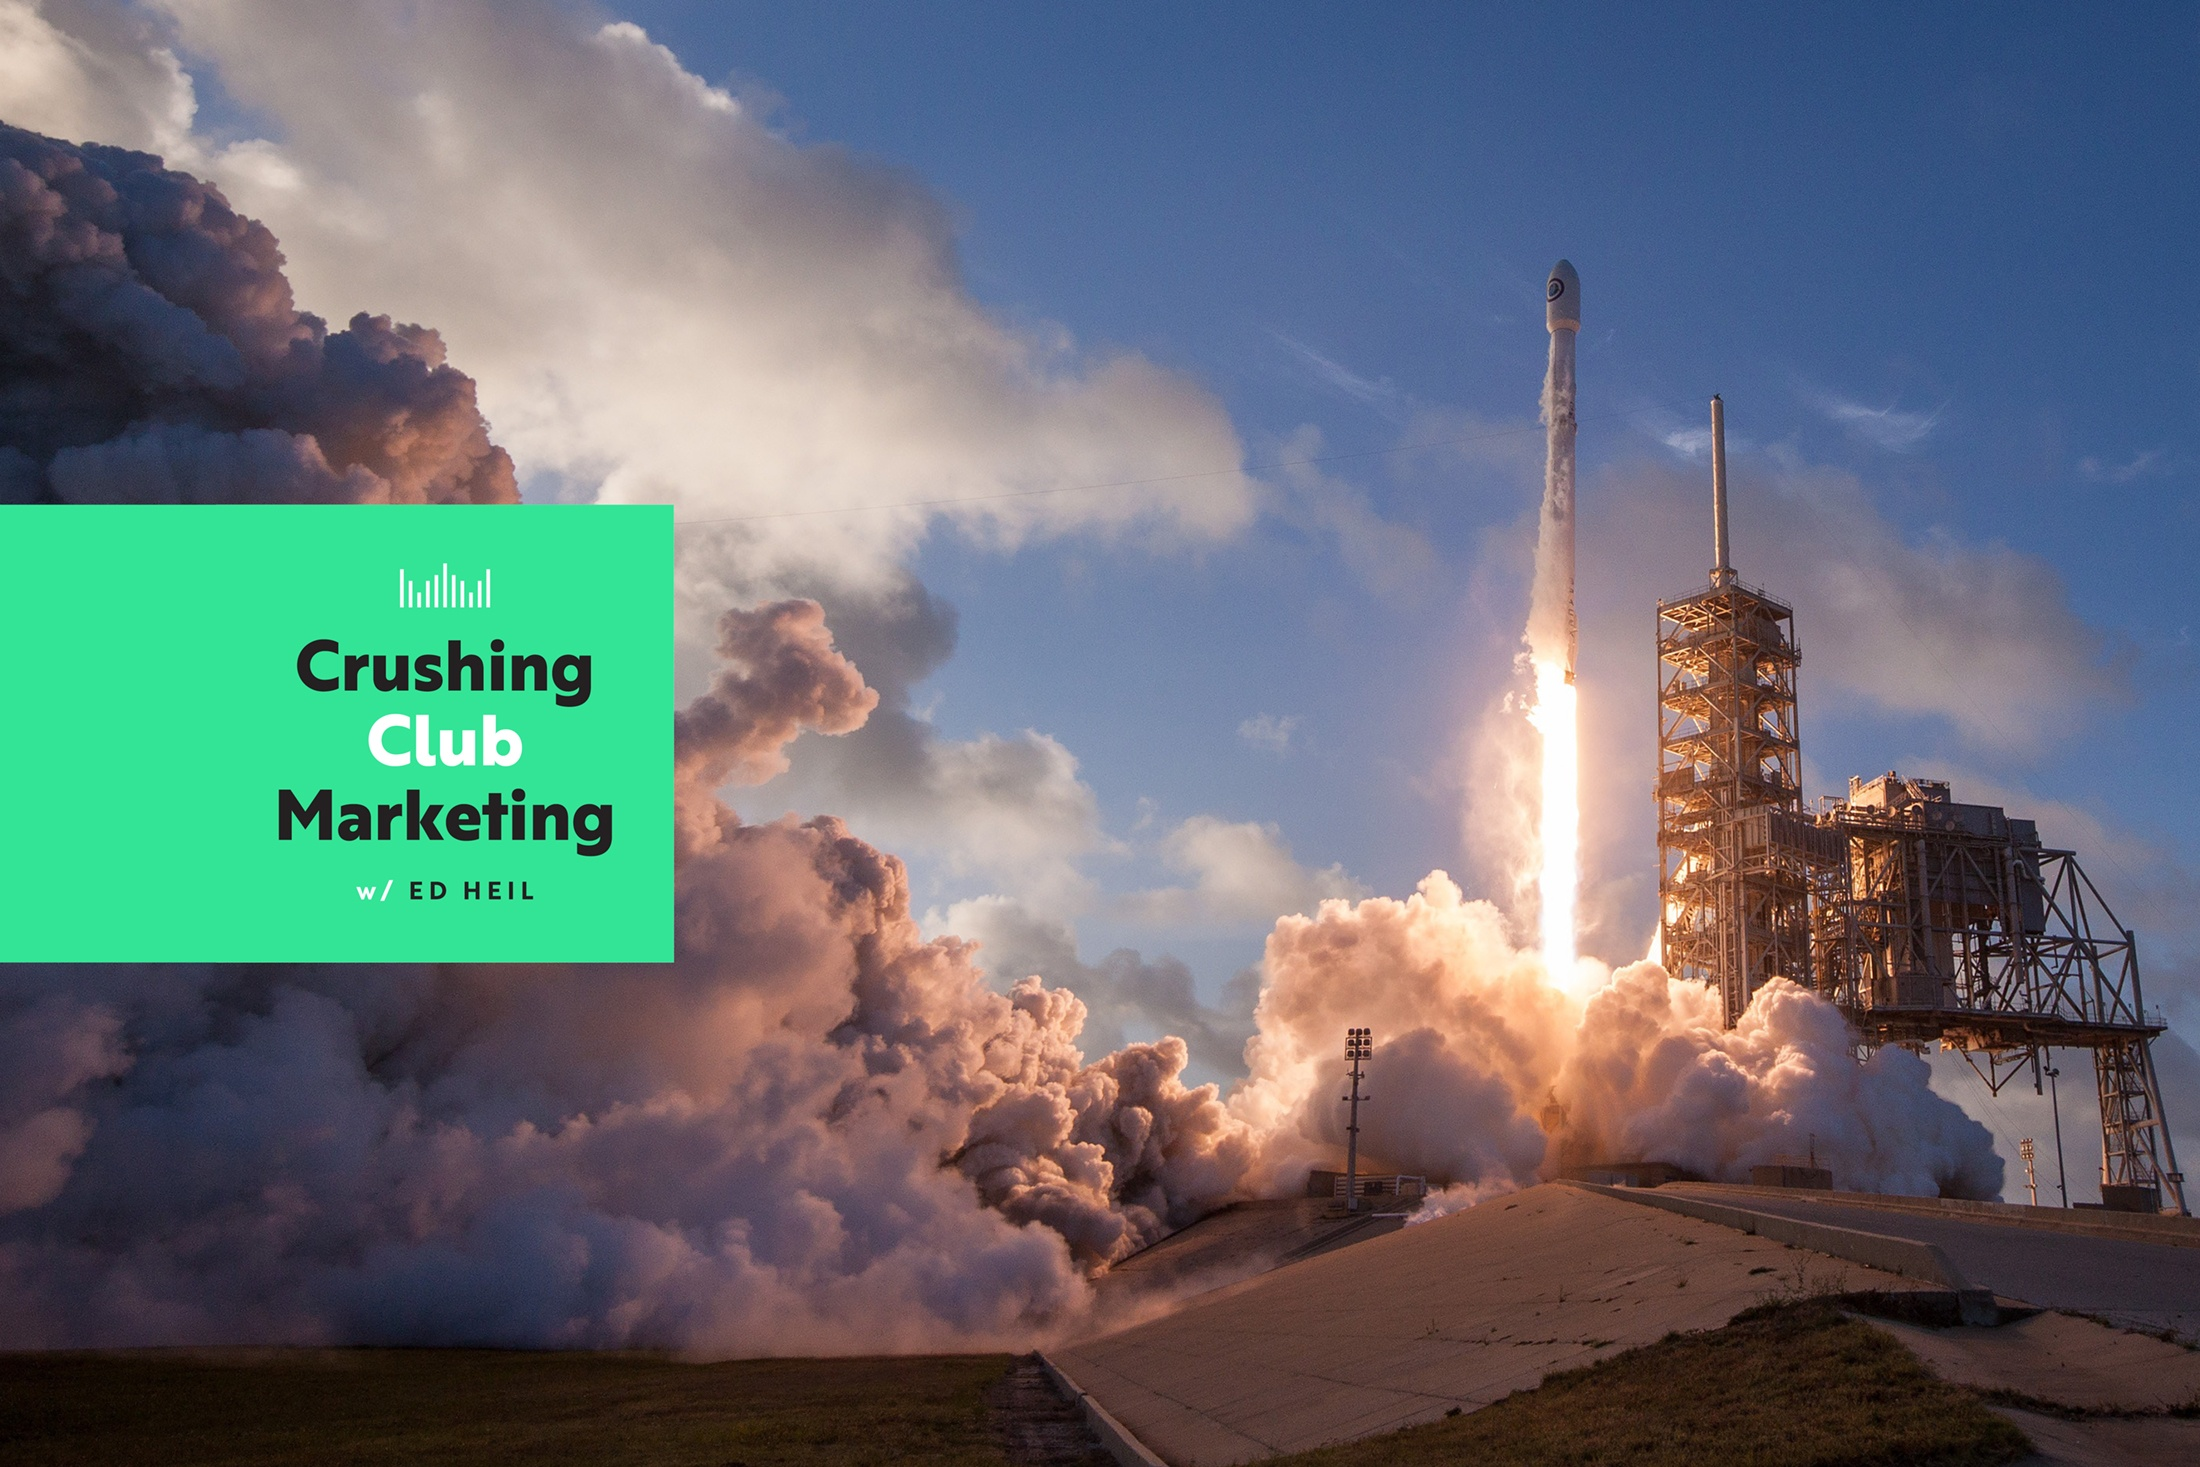 Crushing Club Marketing Blog